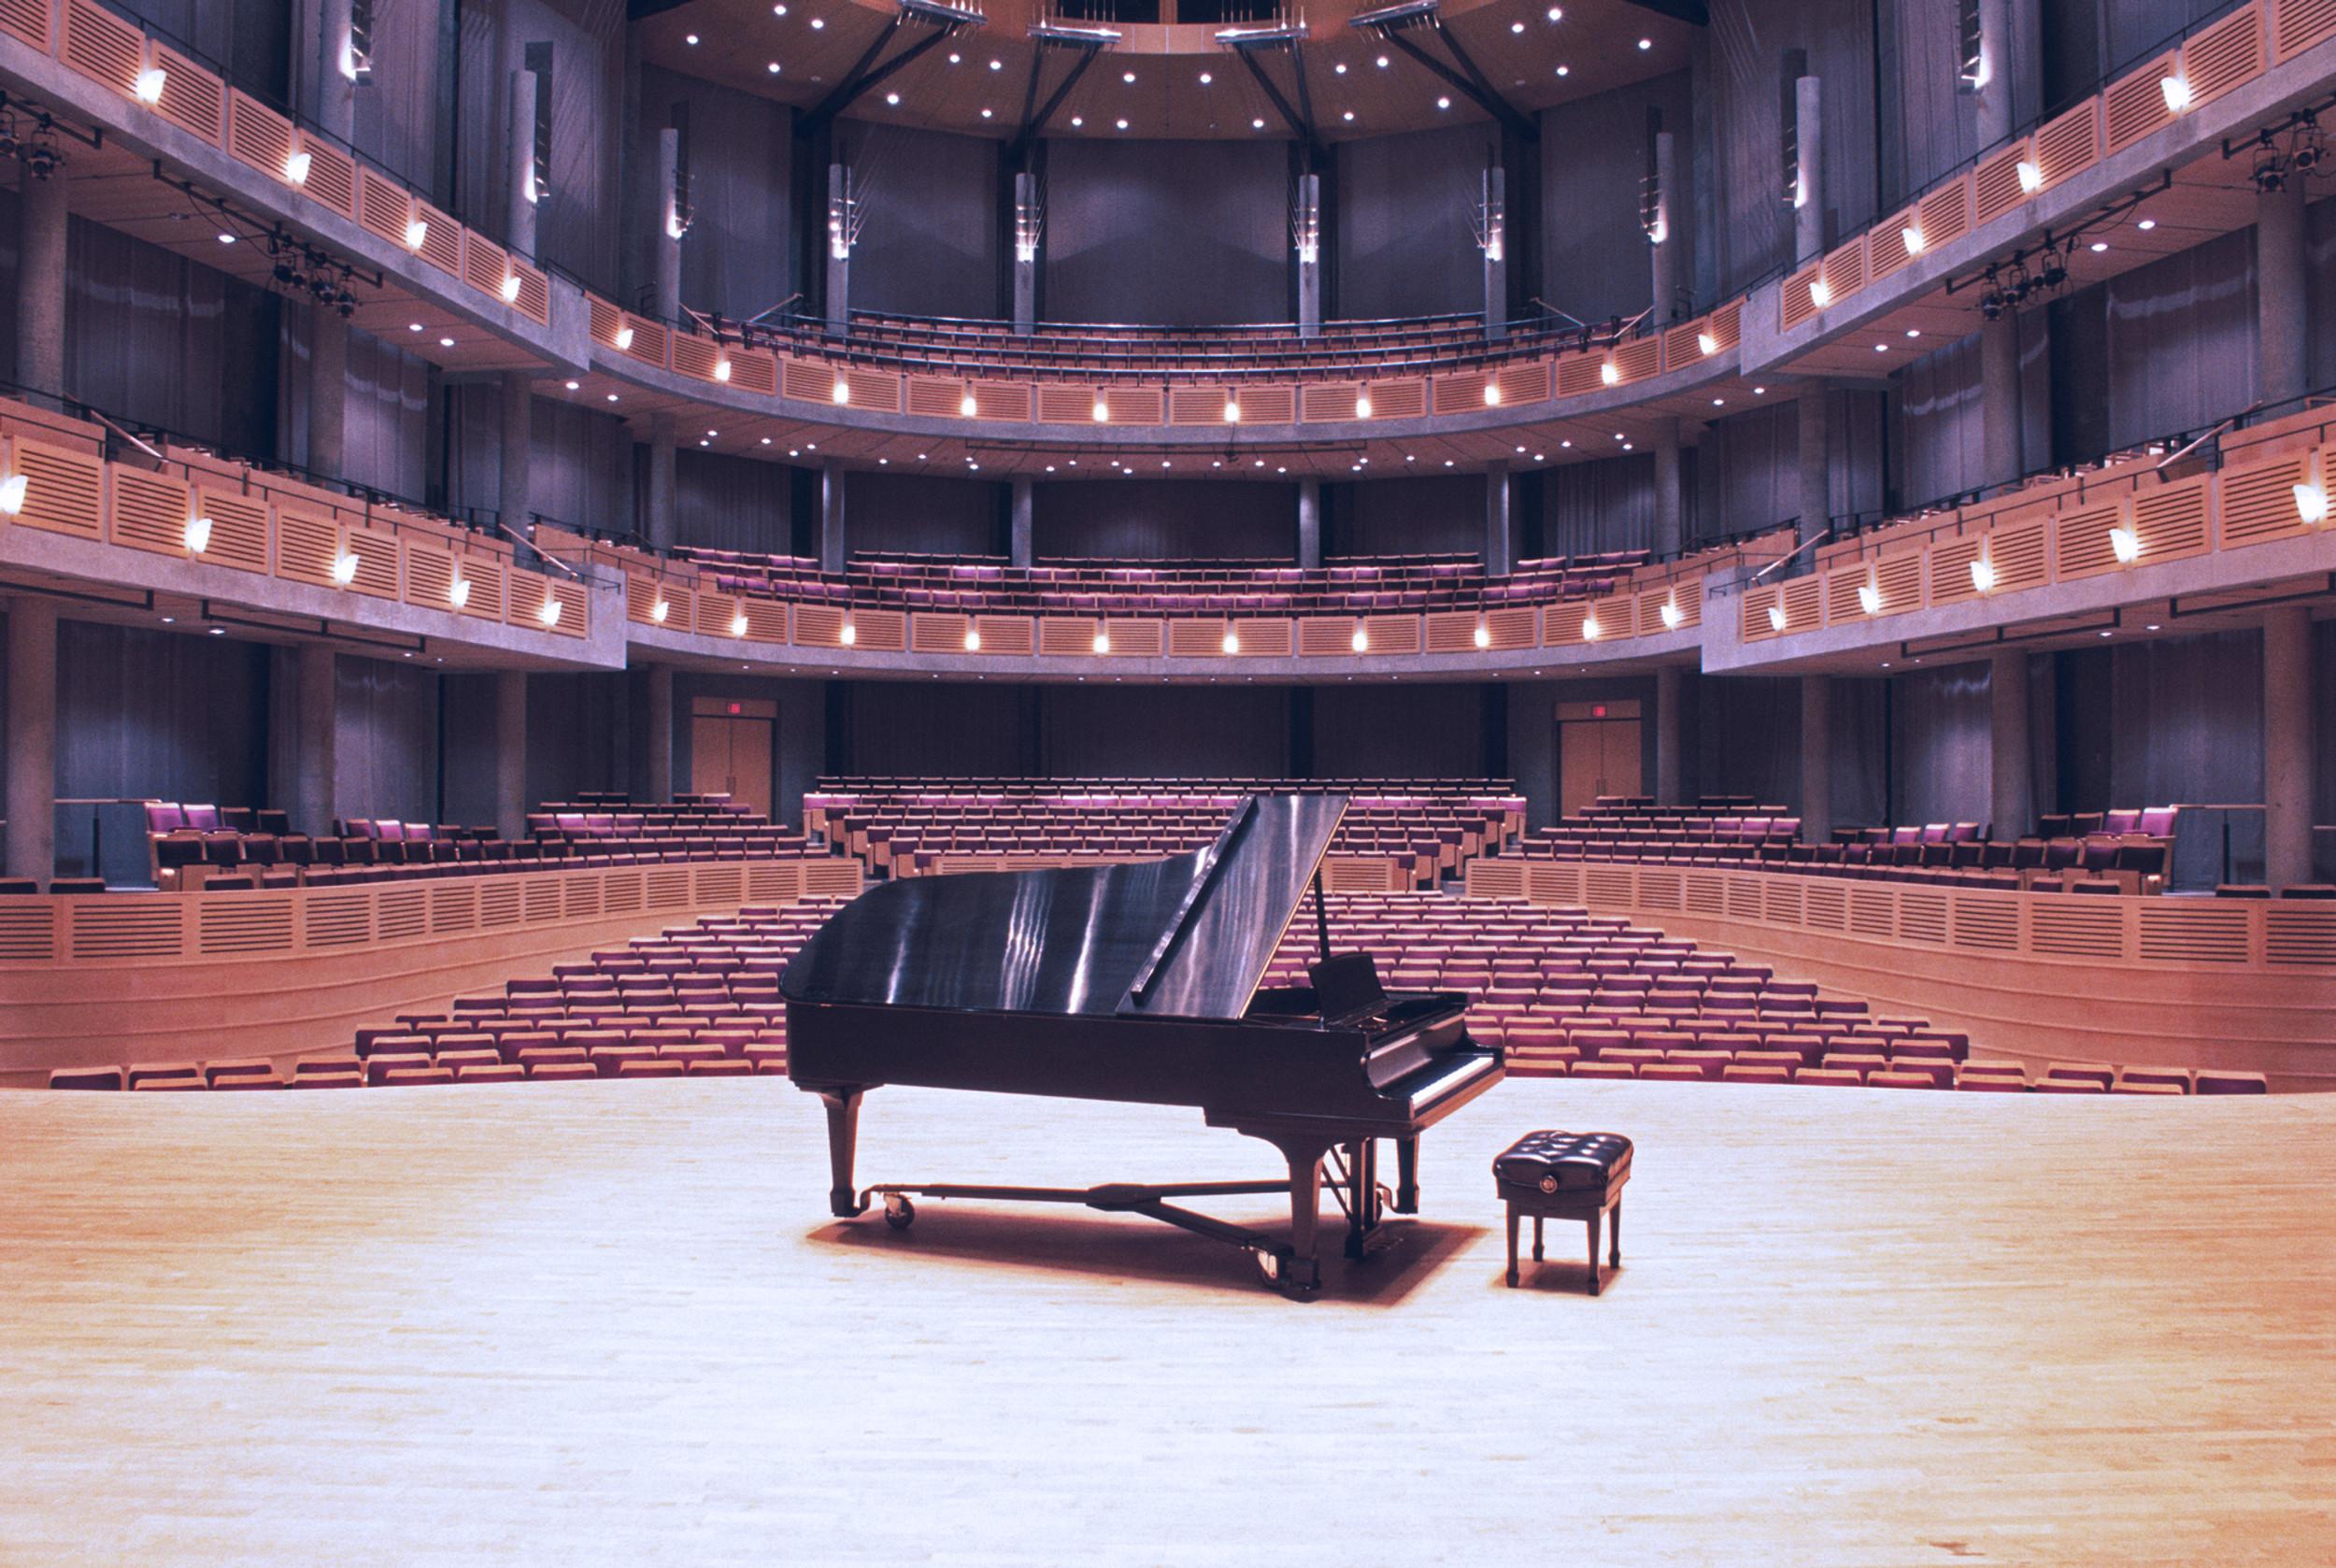 Romantic piano instrumental music mp3 free download